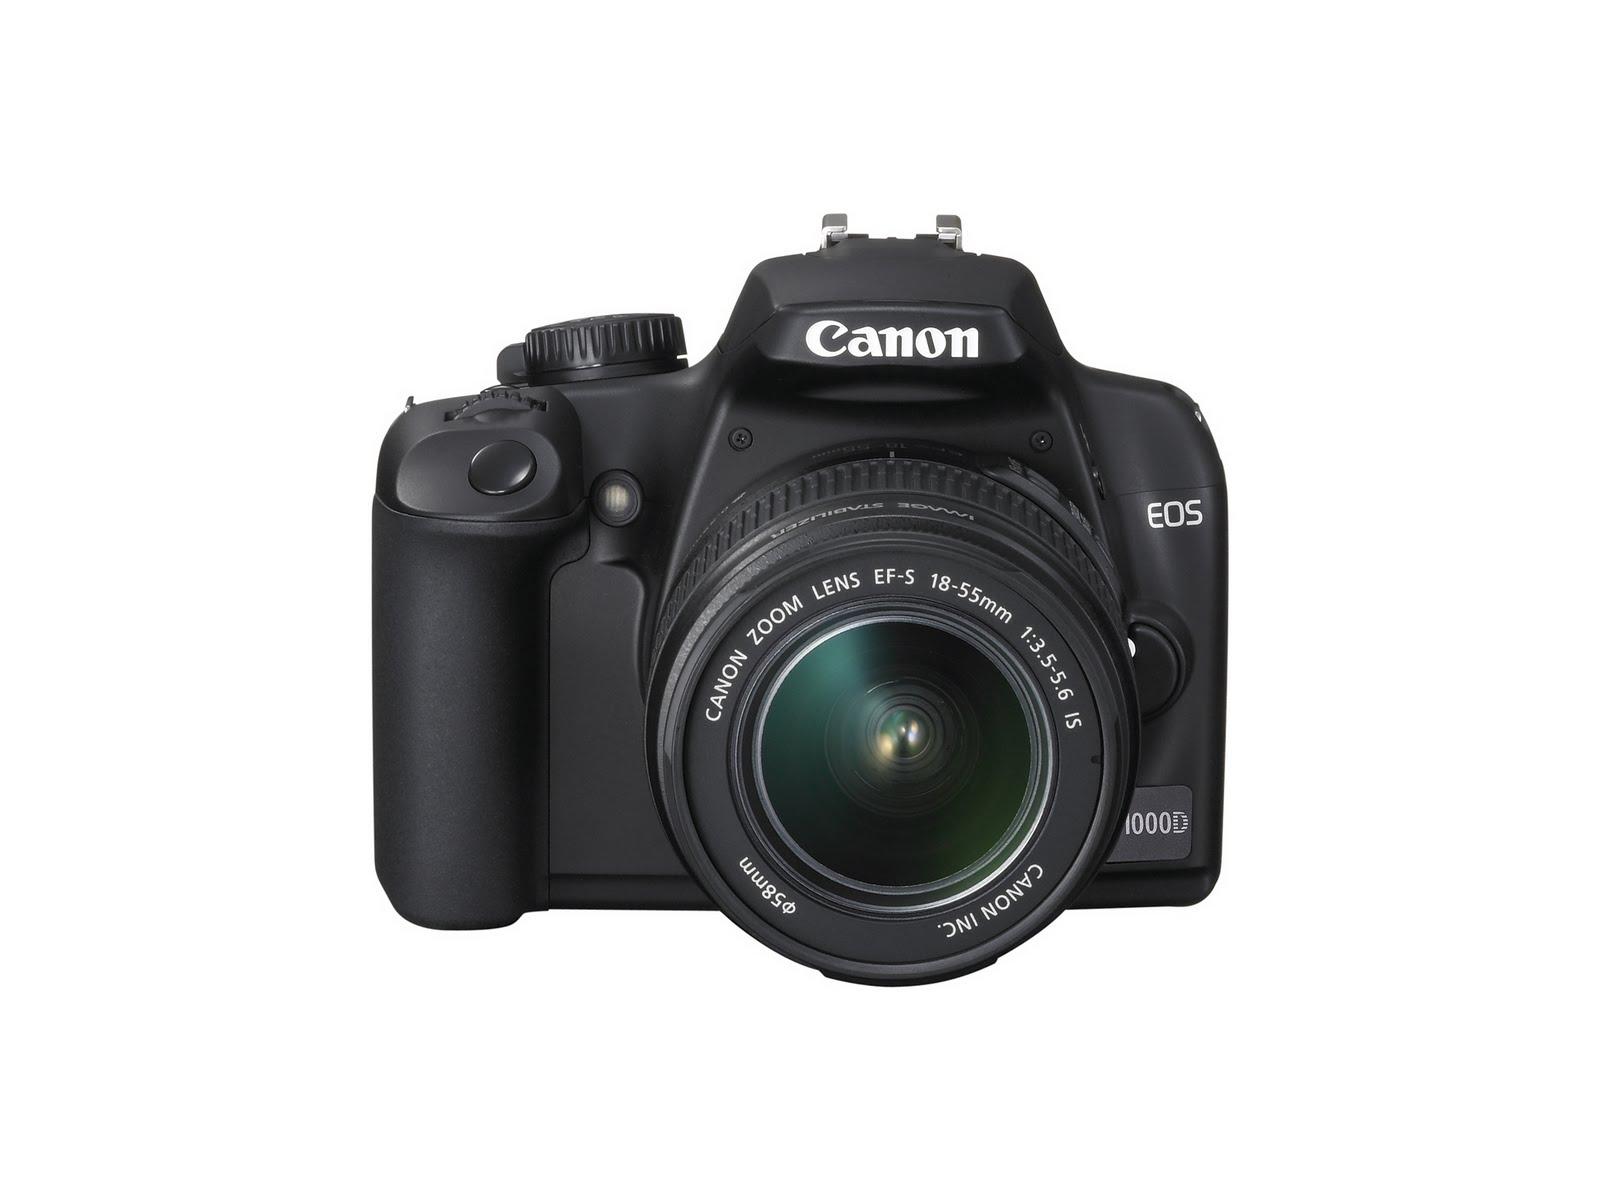 Canon EOS 1000D Rebel XS DSLR camera 1